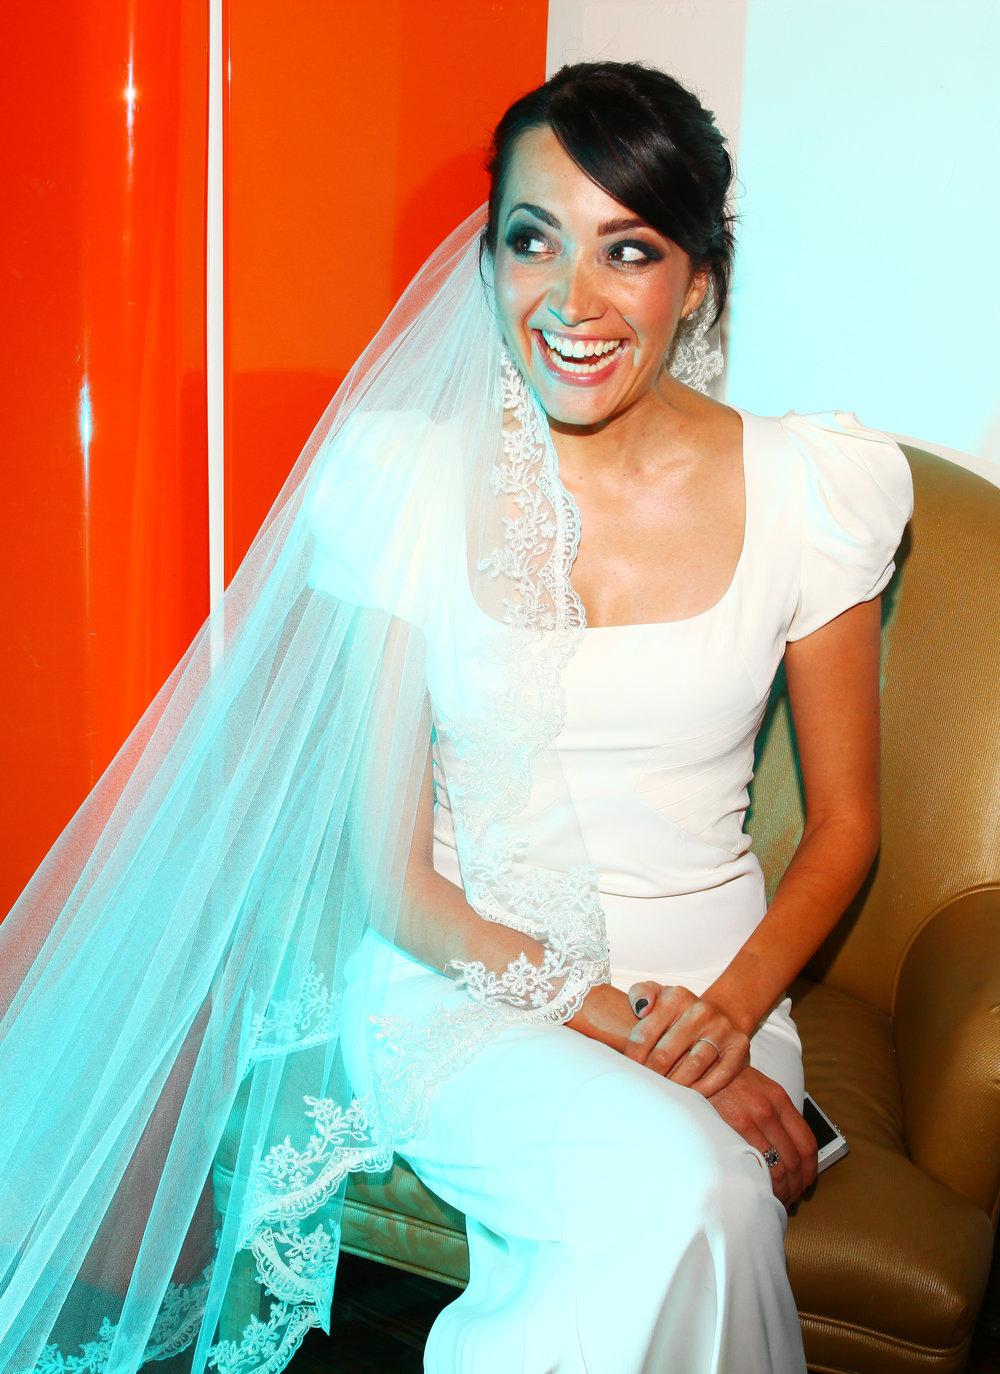 villanova_weddingphotographer_6.jpg